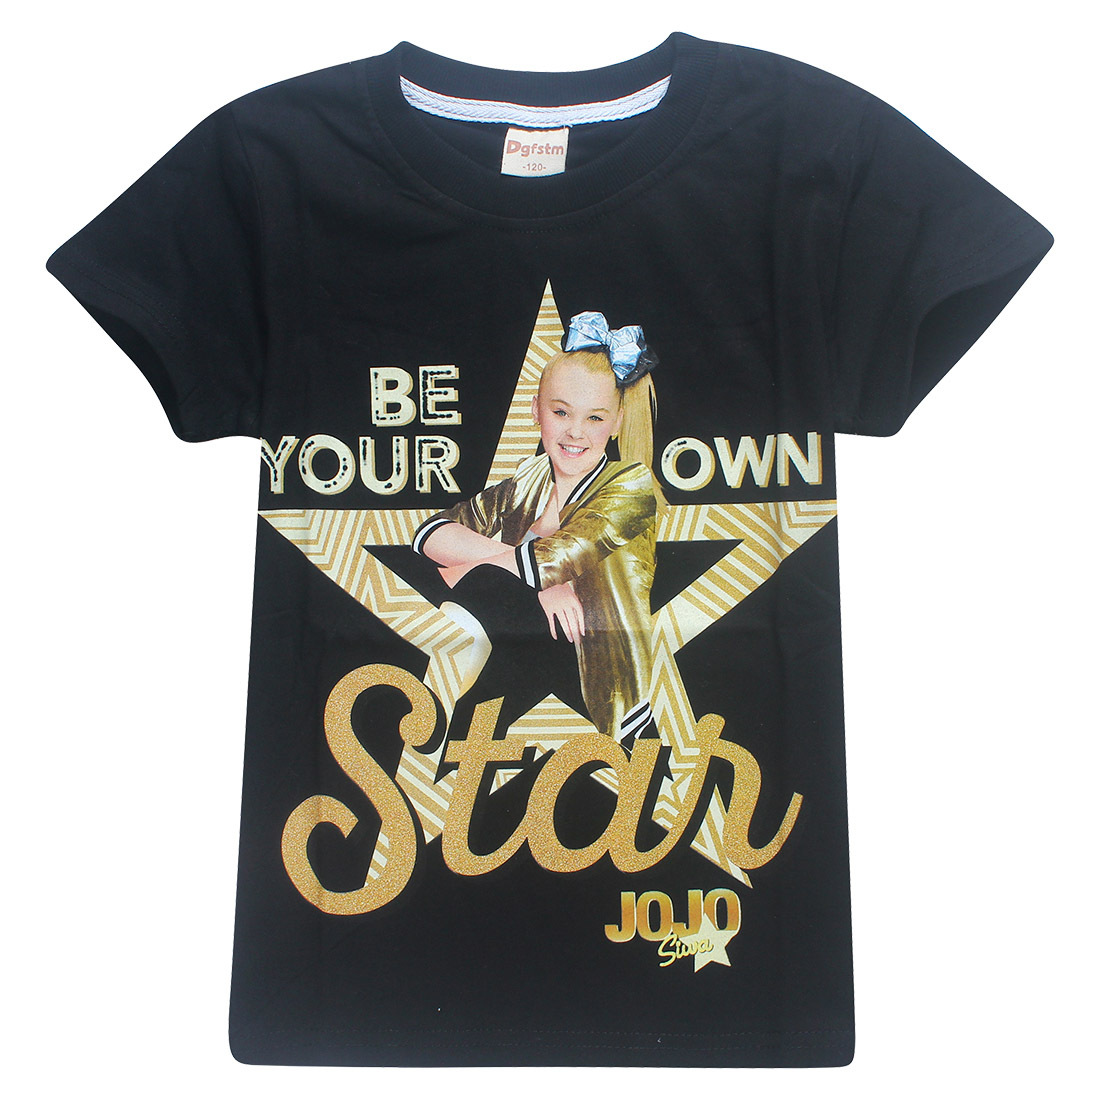 2018 New Summer Jojo Siwa Shirts Baby Girls Tshirts Short Sleeve T Shirts for Kids Bobo Choses T-shirt Child Sport Clothes 4-12Y